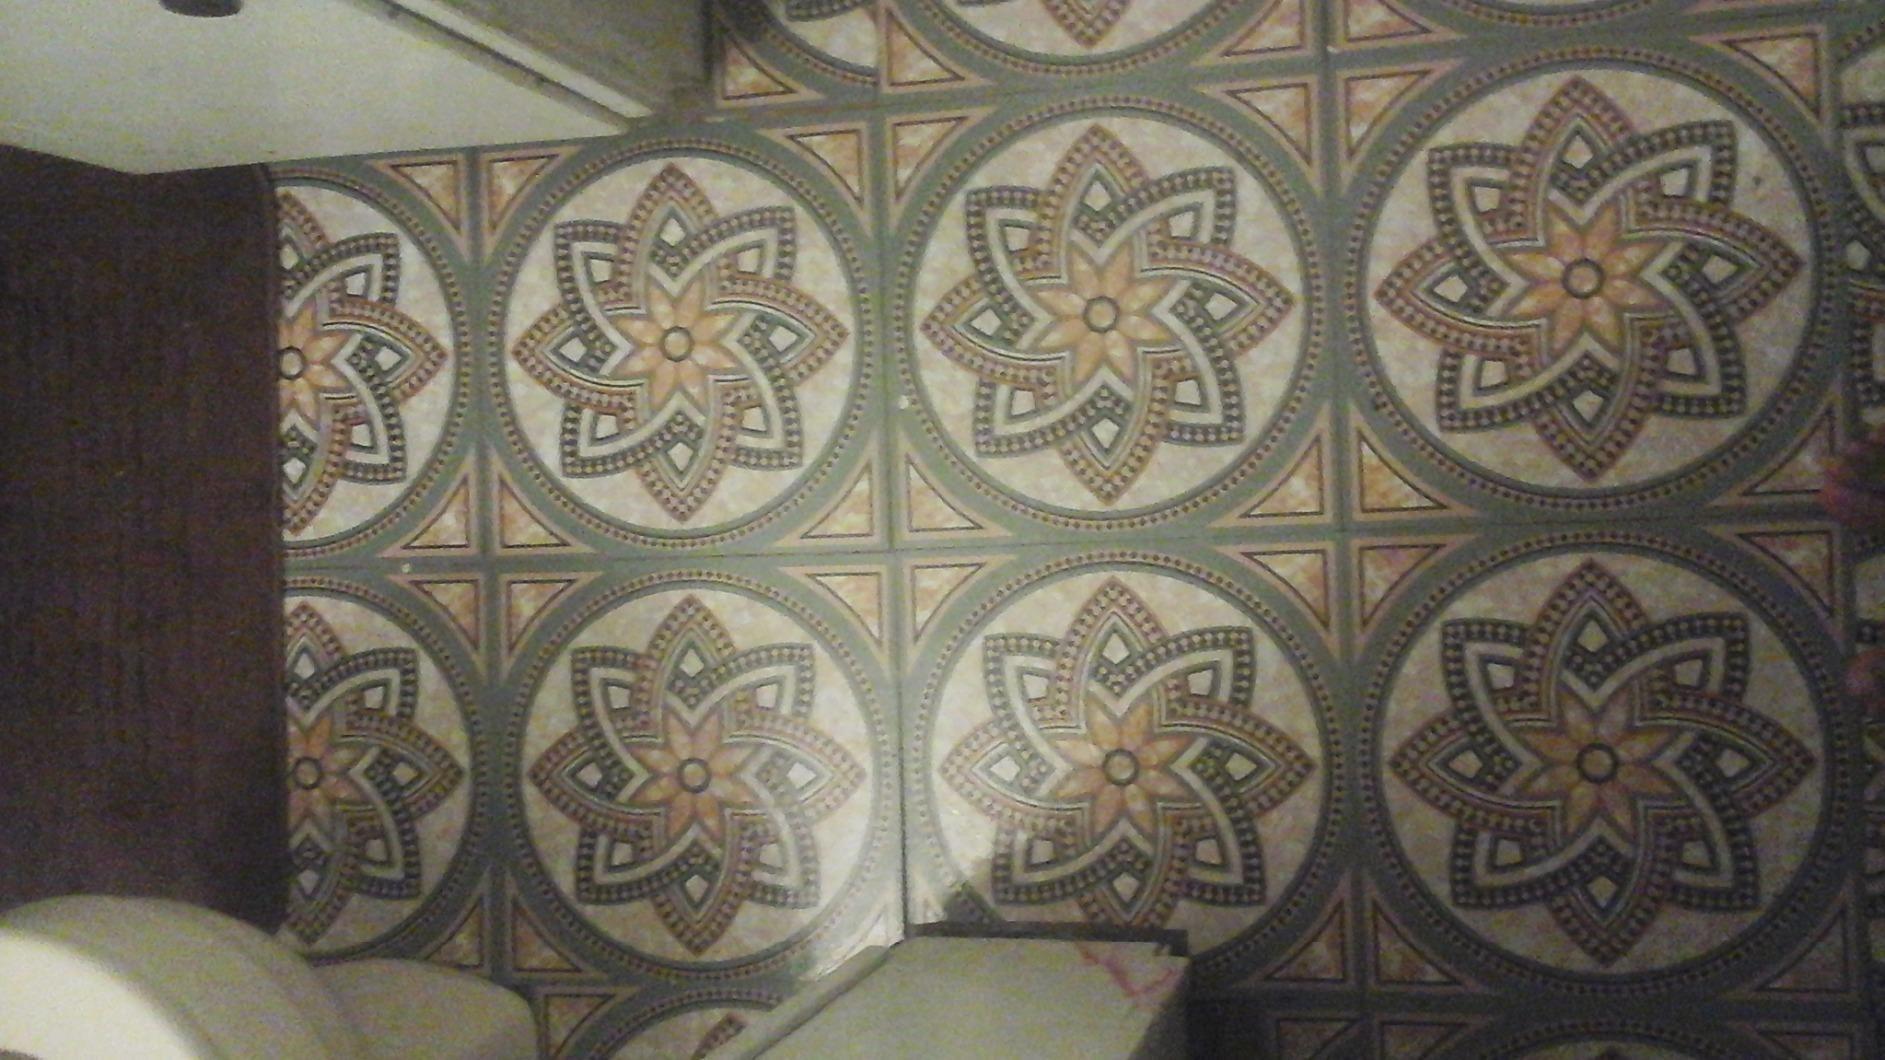 Amazon home dynamix 1009 dynamix vinyl tile 12 by 12 inch amazon home dynamix 1009 dynamix vinyl tile 12 by 12 inch dailygadgetfo Images